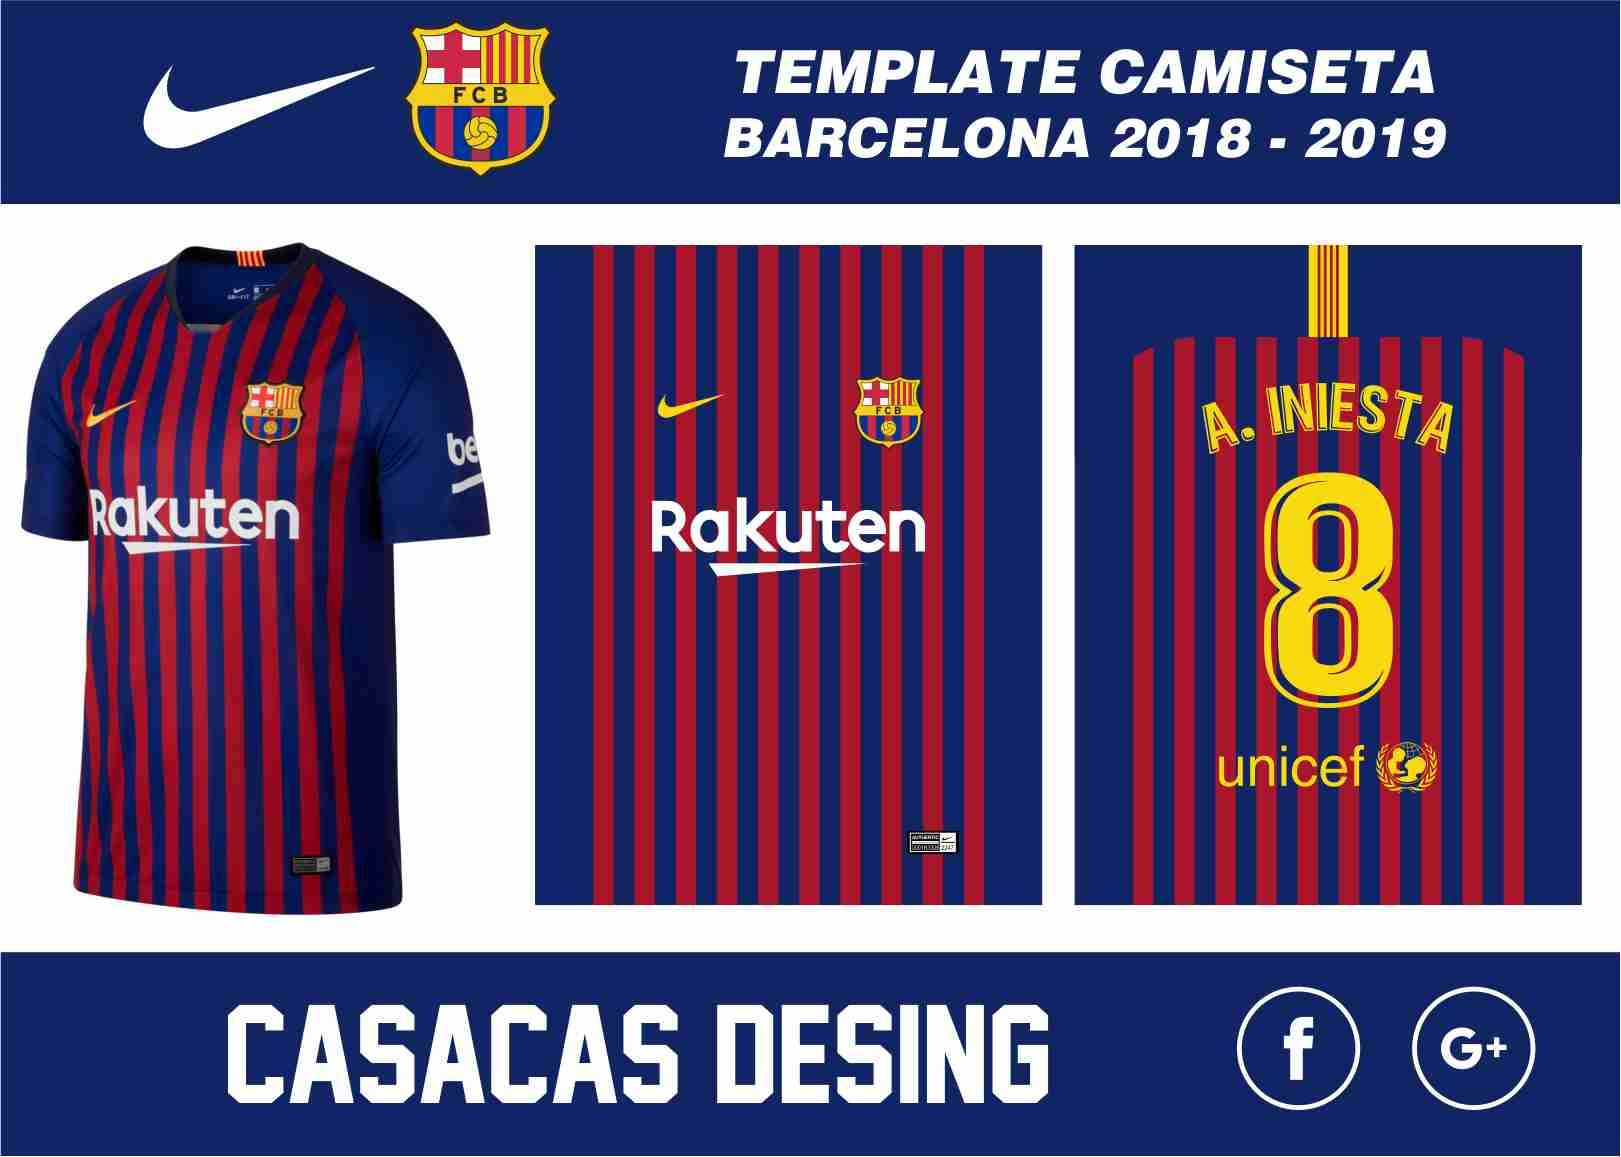 82fbfa4c31692 Camiseta Barcelona 2018 - 2019 vector